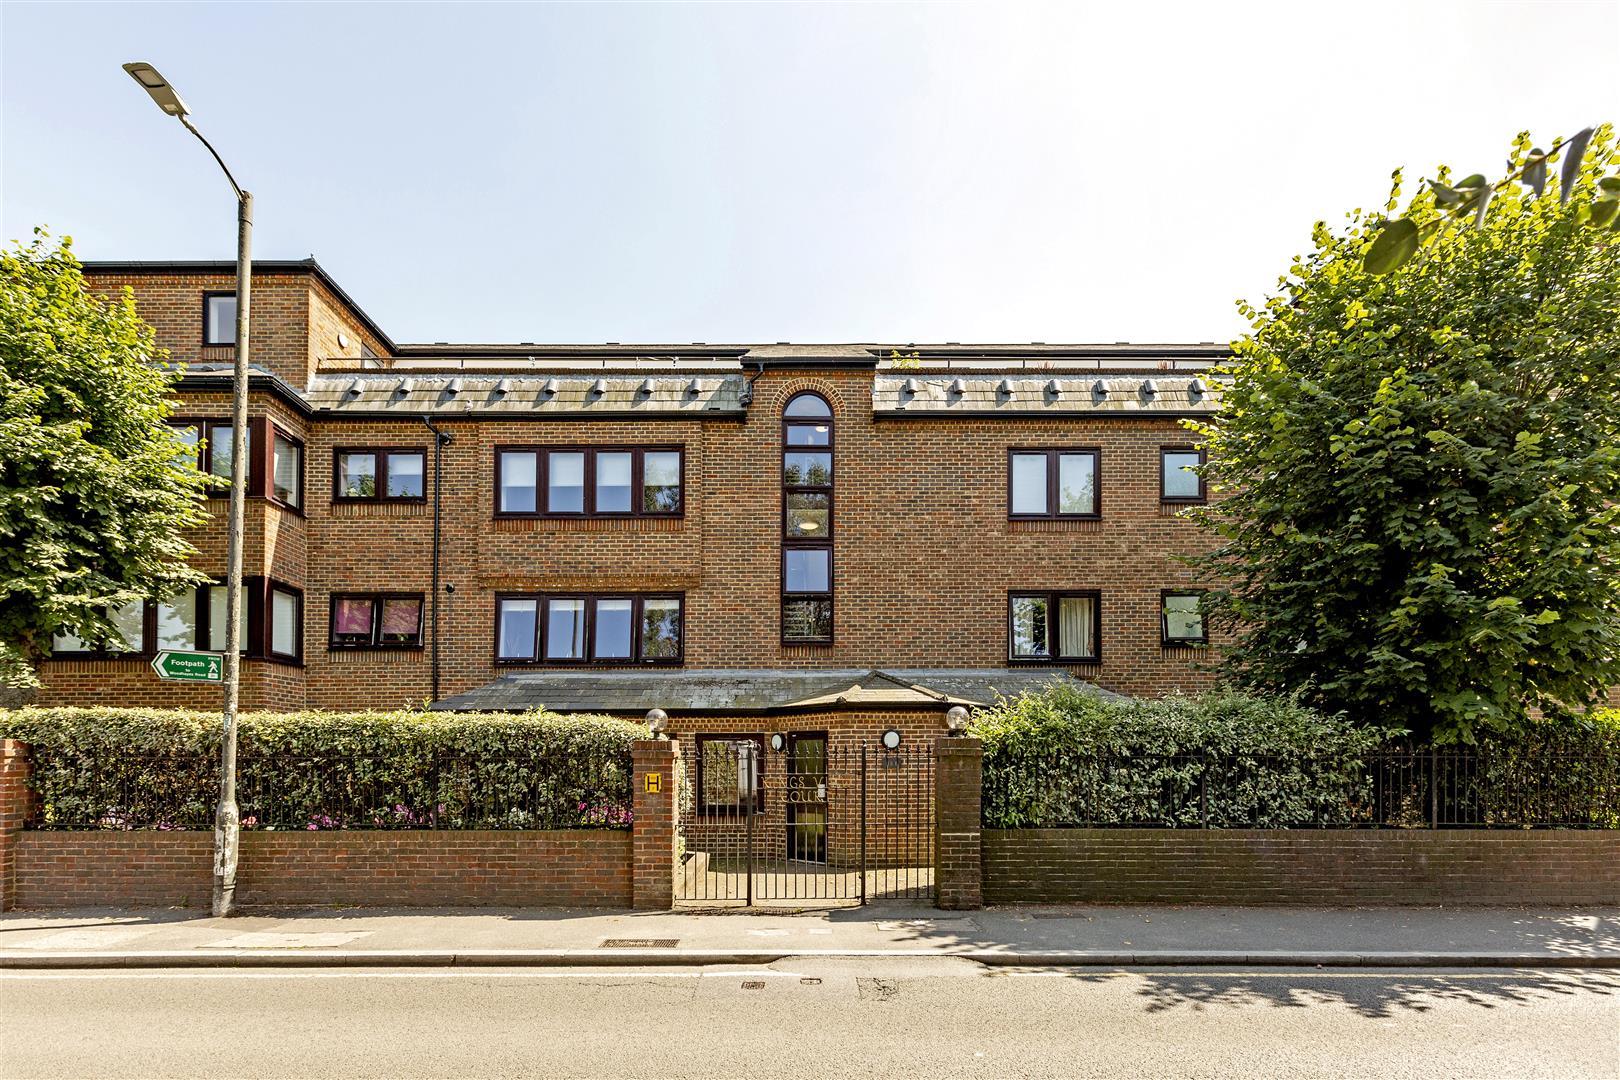 Ridgway, London - Andrew Scott Robertson